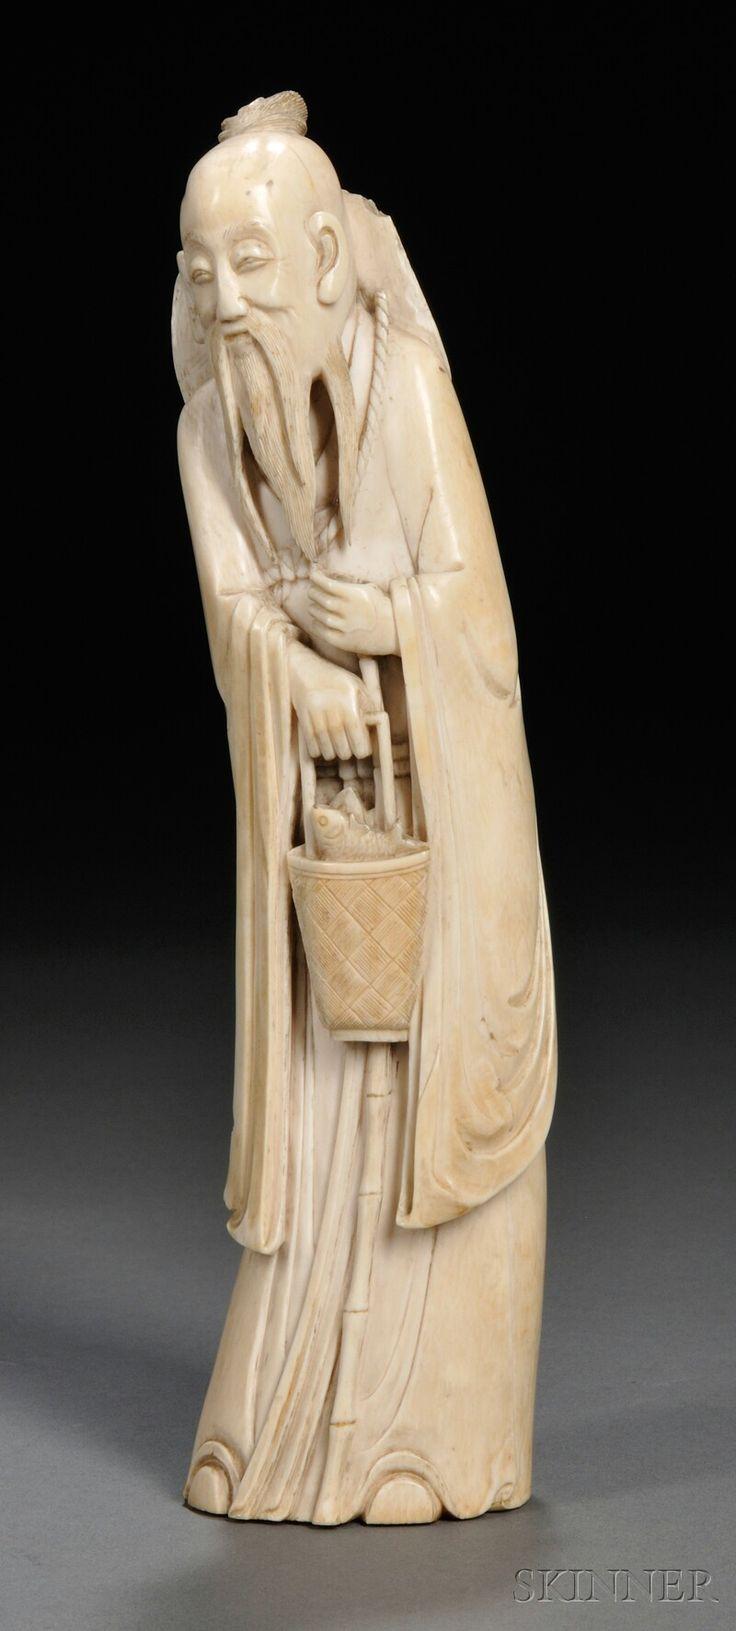 Best antique ivory bone carving images on pinterest